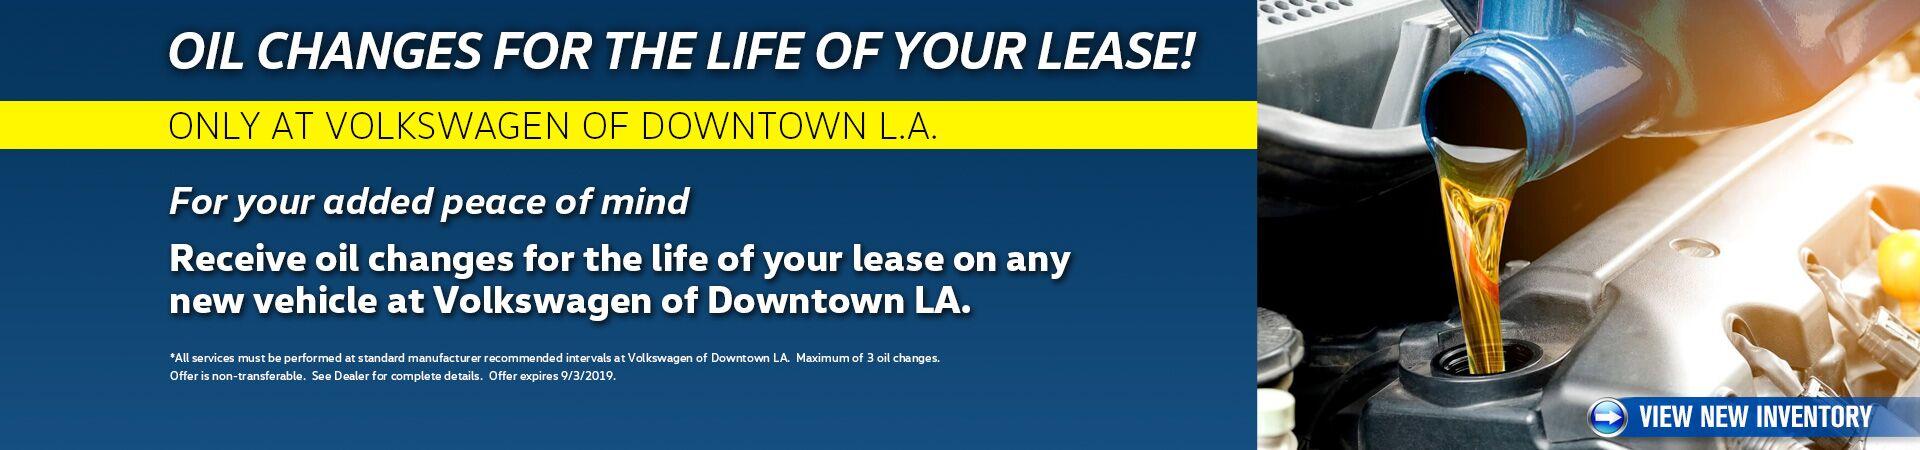 Volkswagen Dealership Los Angeles CA | Used Cars Volkswagen